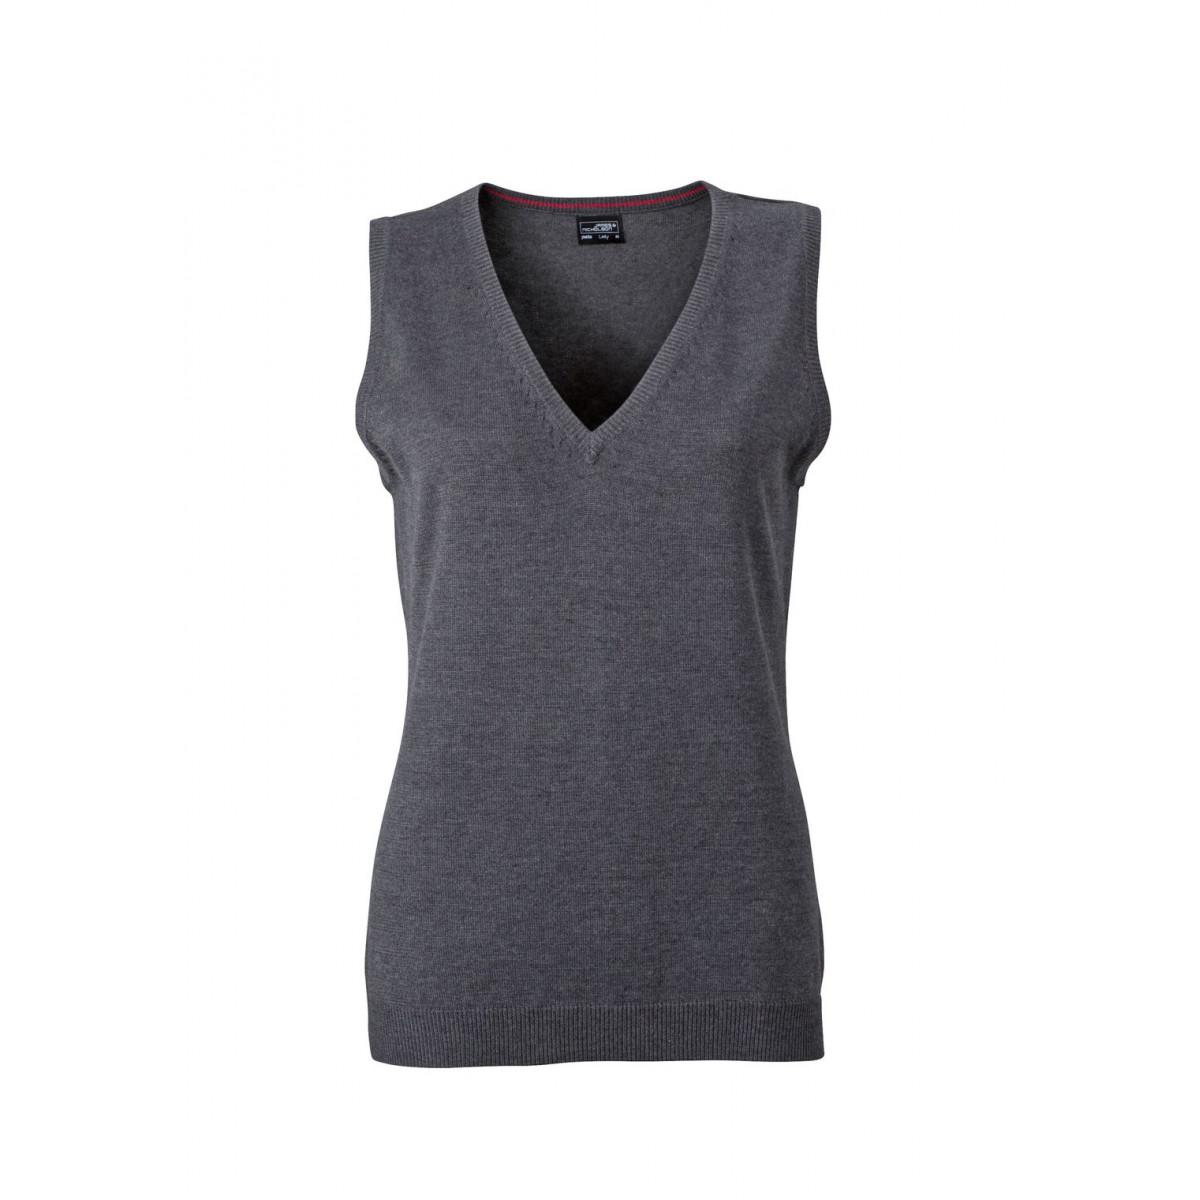 Жилет вязаный женский JN656 Ladies V-Neck Pullunder - Темно-серый меланж